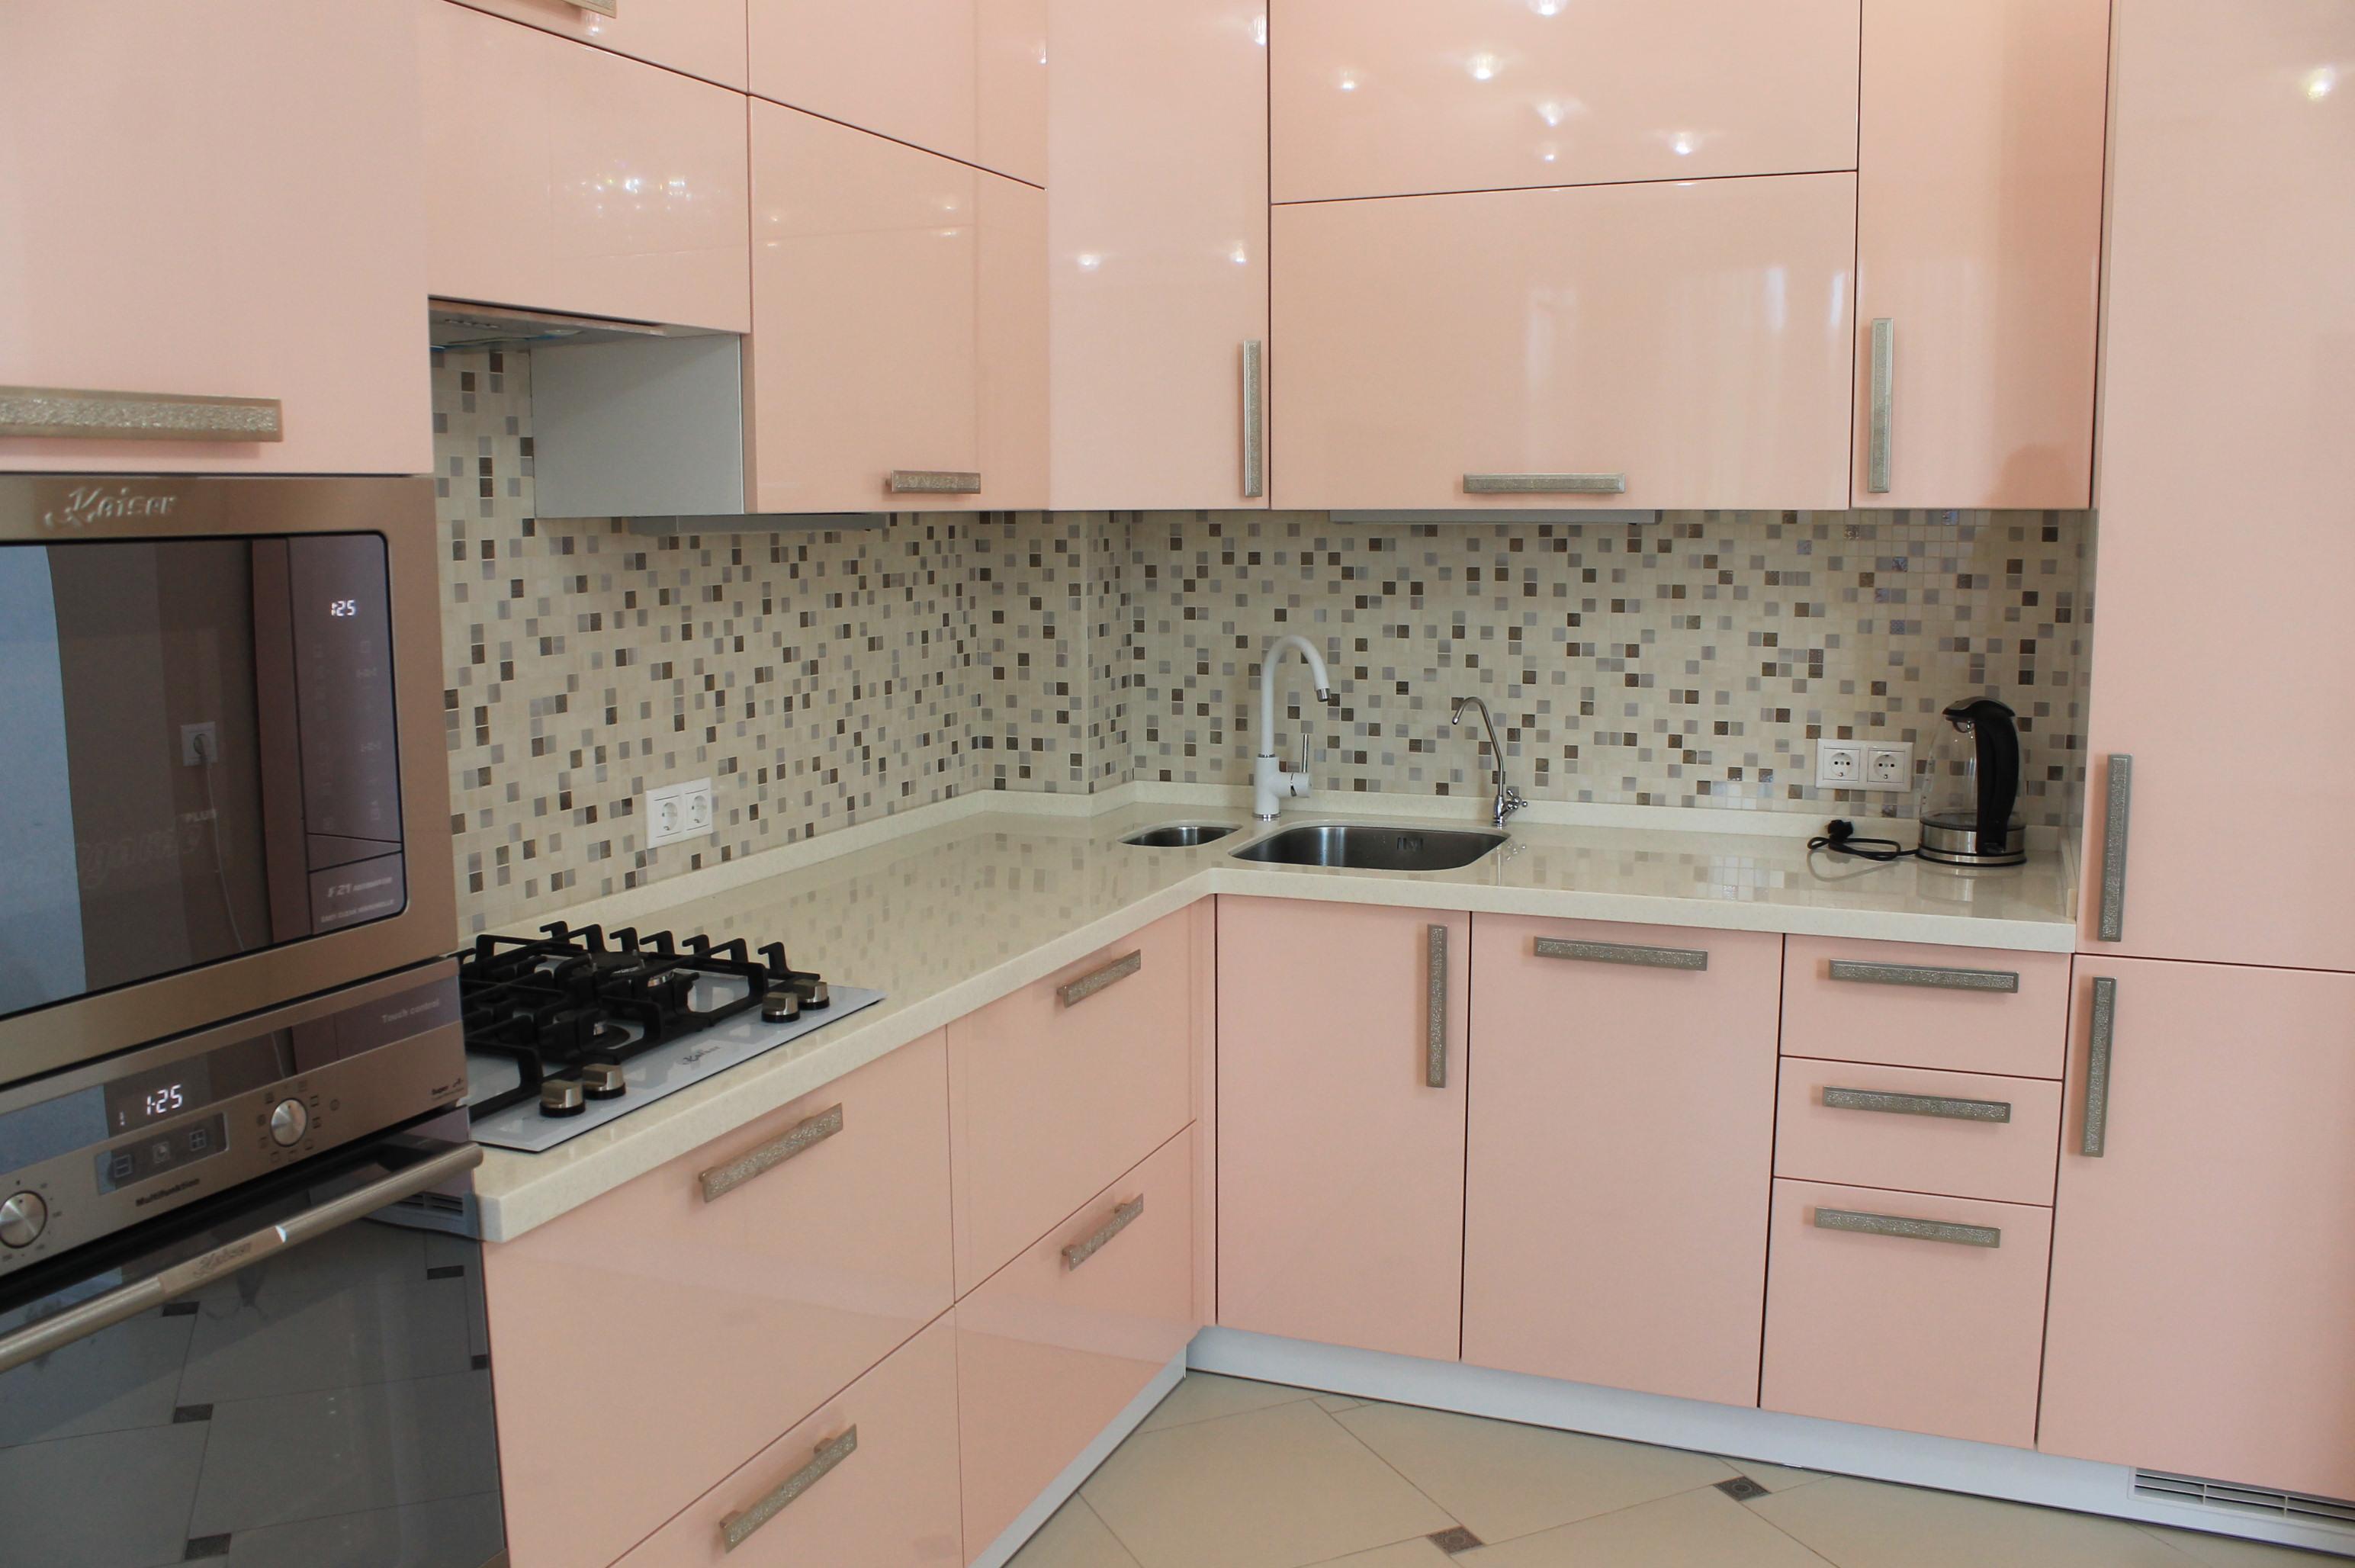 современный кухонный гарнитур.JPG